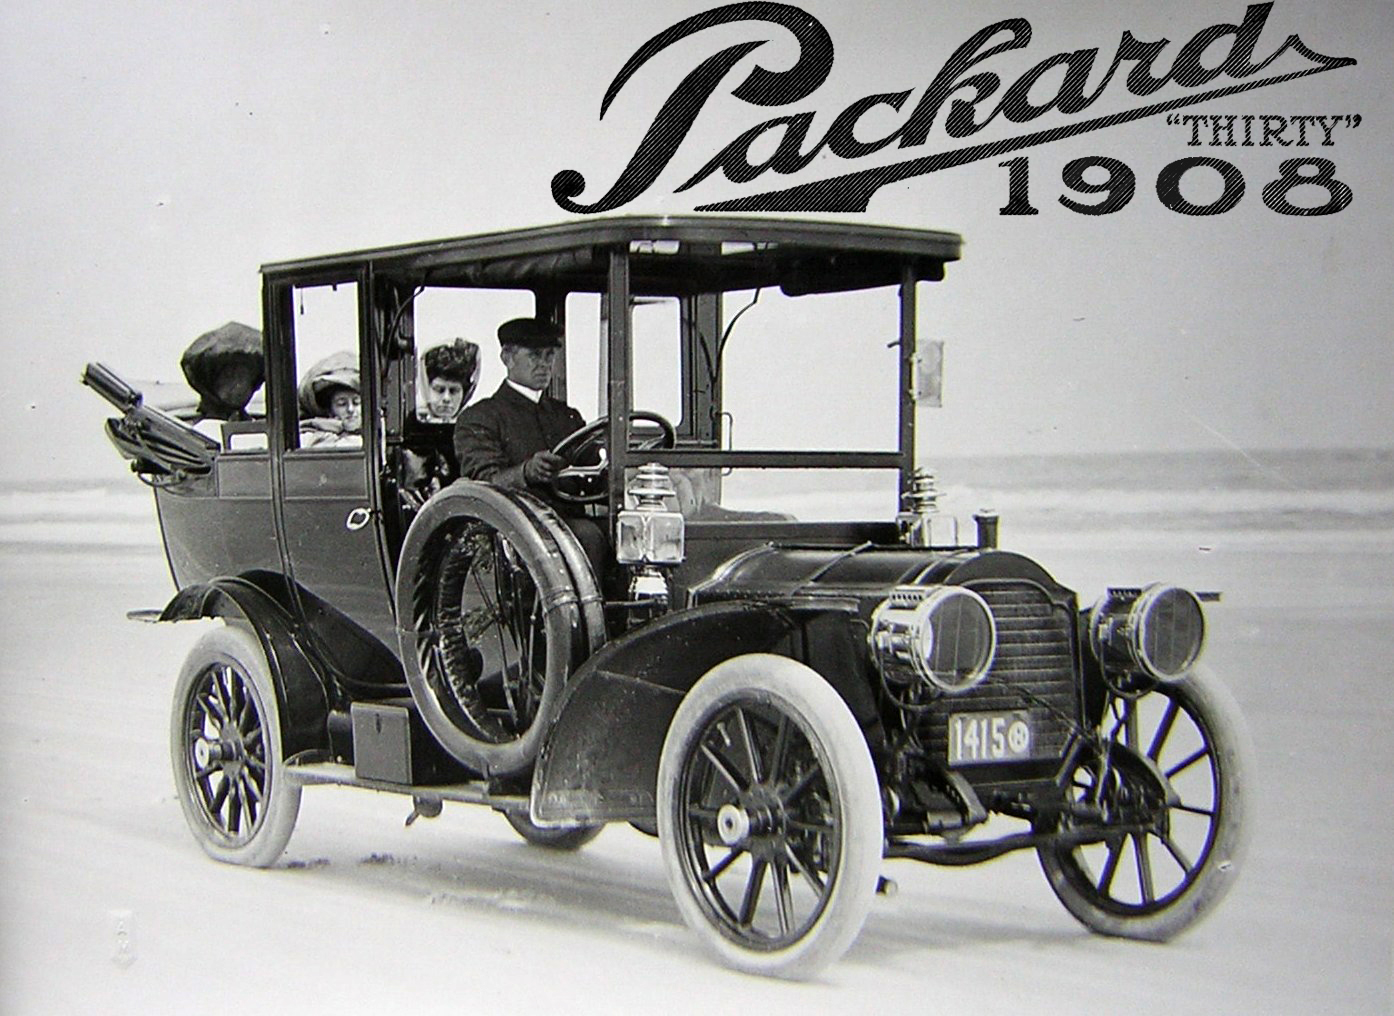 1908 Automobile Show